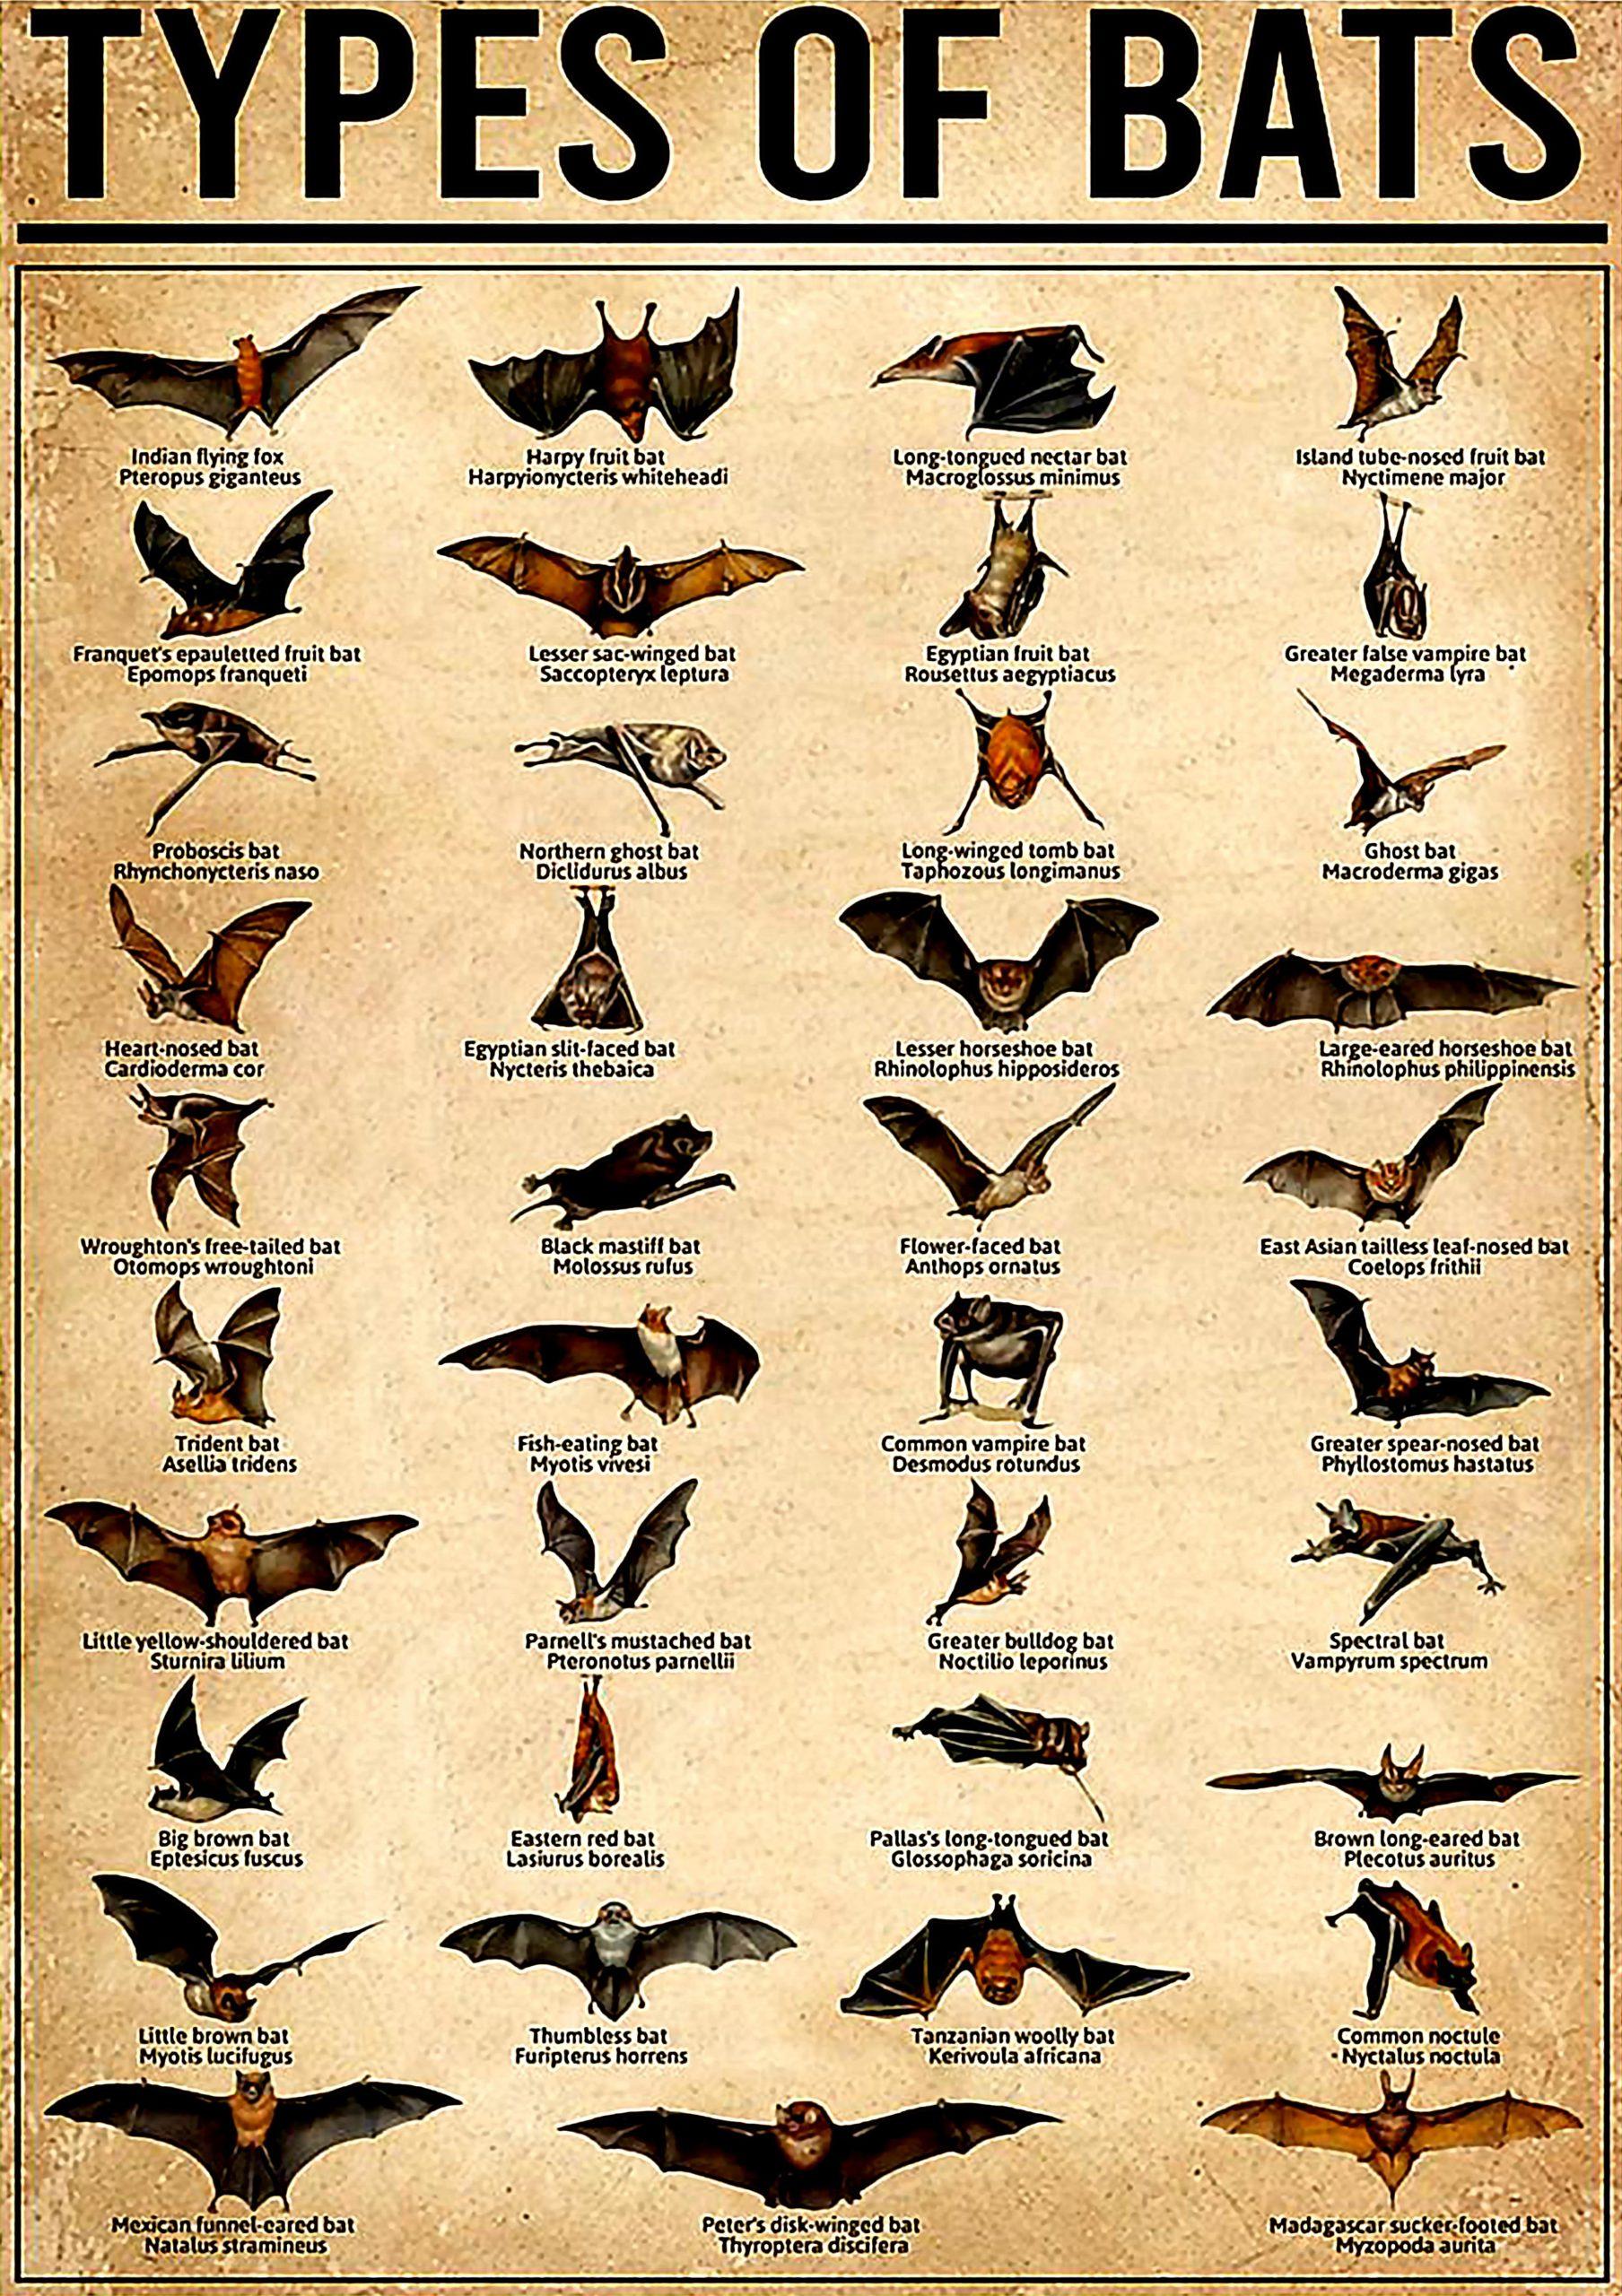 vintage types of bats poster 1 - Copy